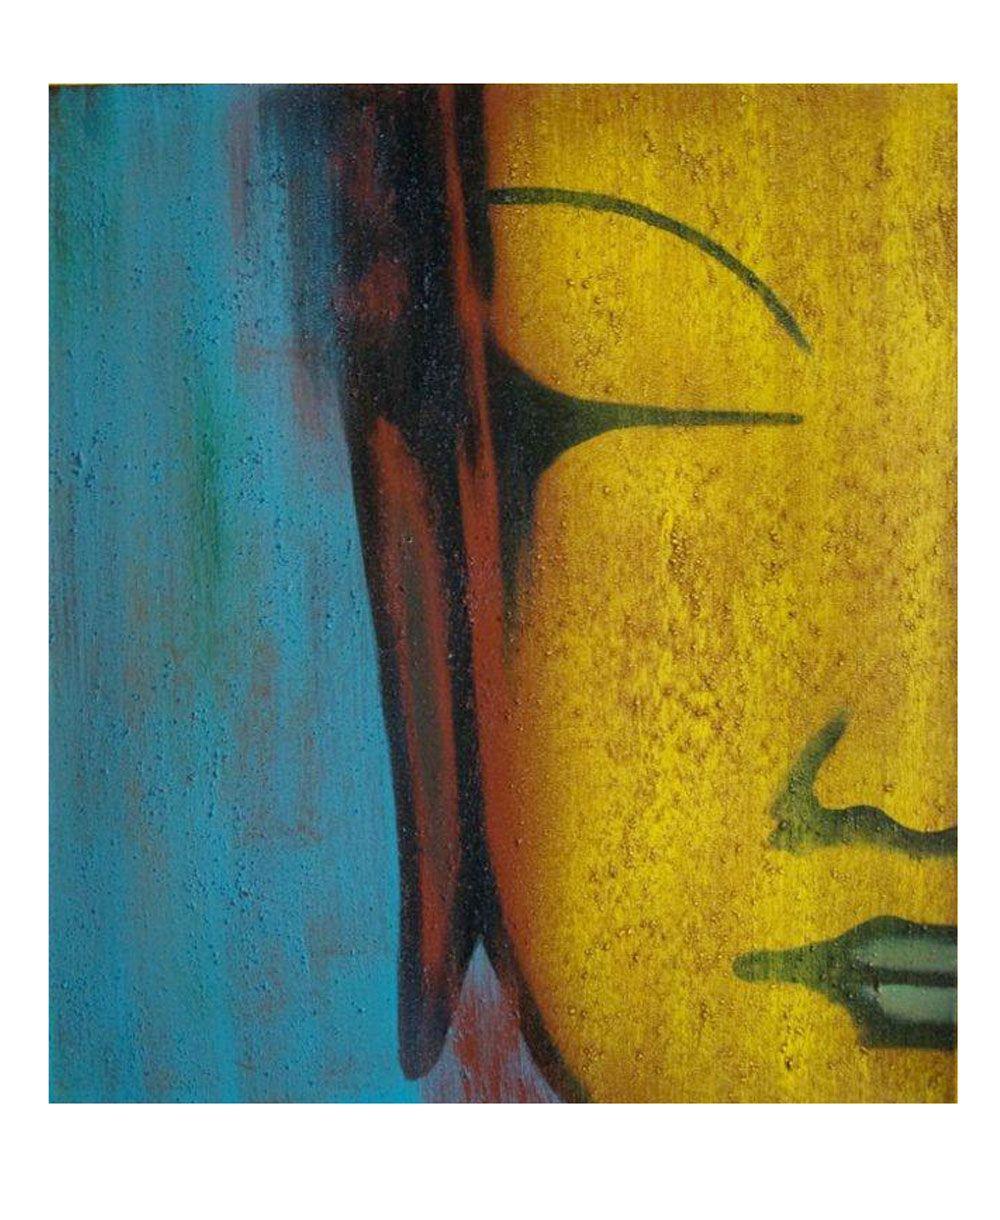 Buddhist wall painting